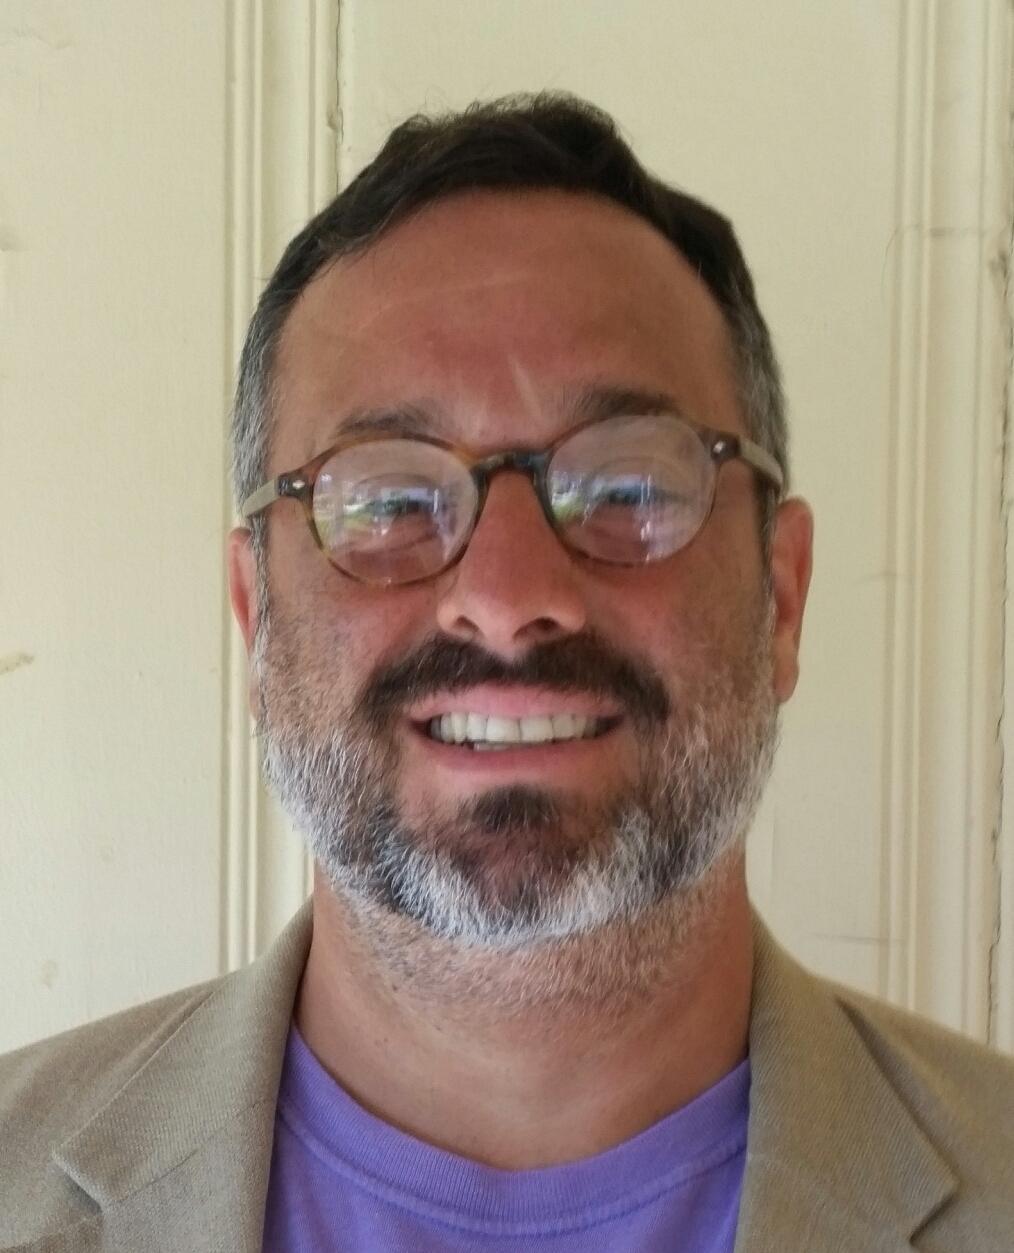 Jeffrey Demsky